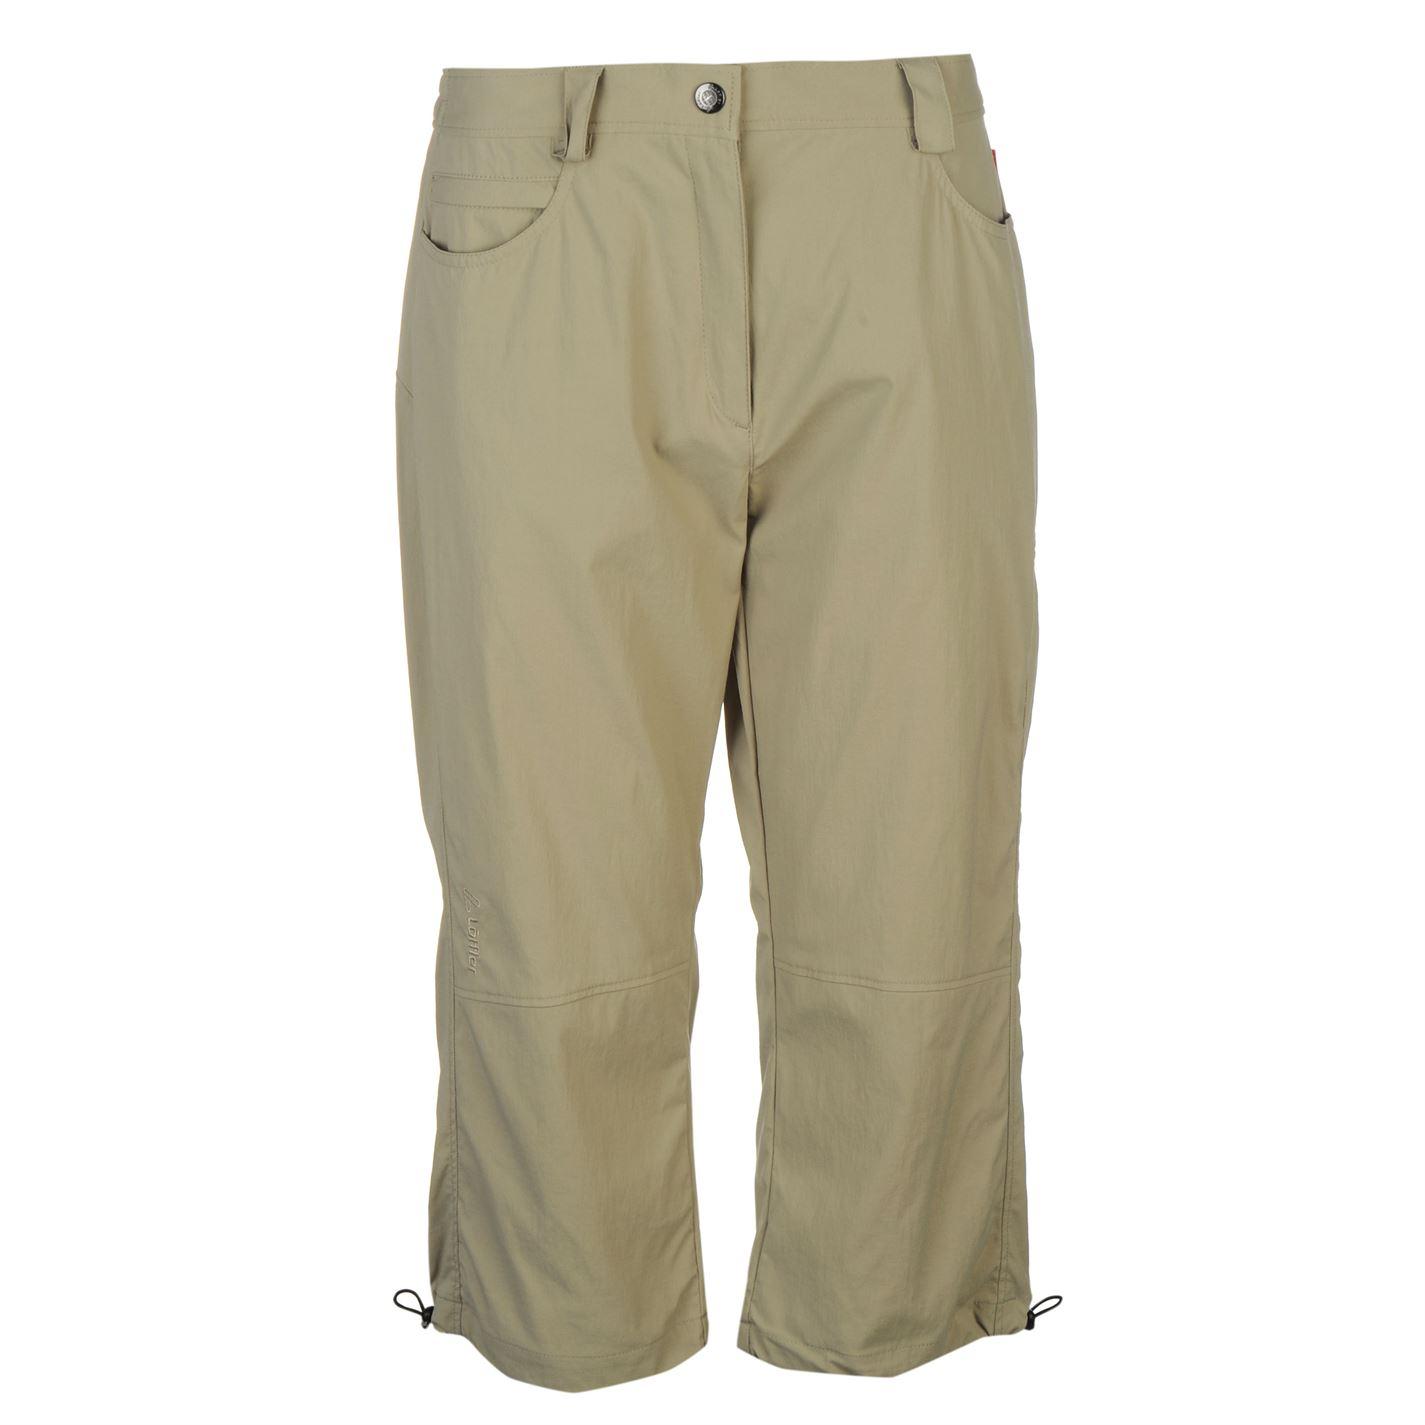 Löffler Three Quarter Outdoor Trousers Ladies